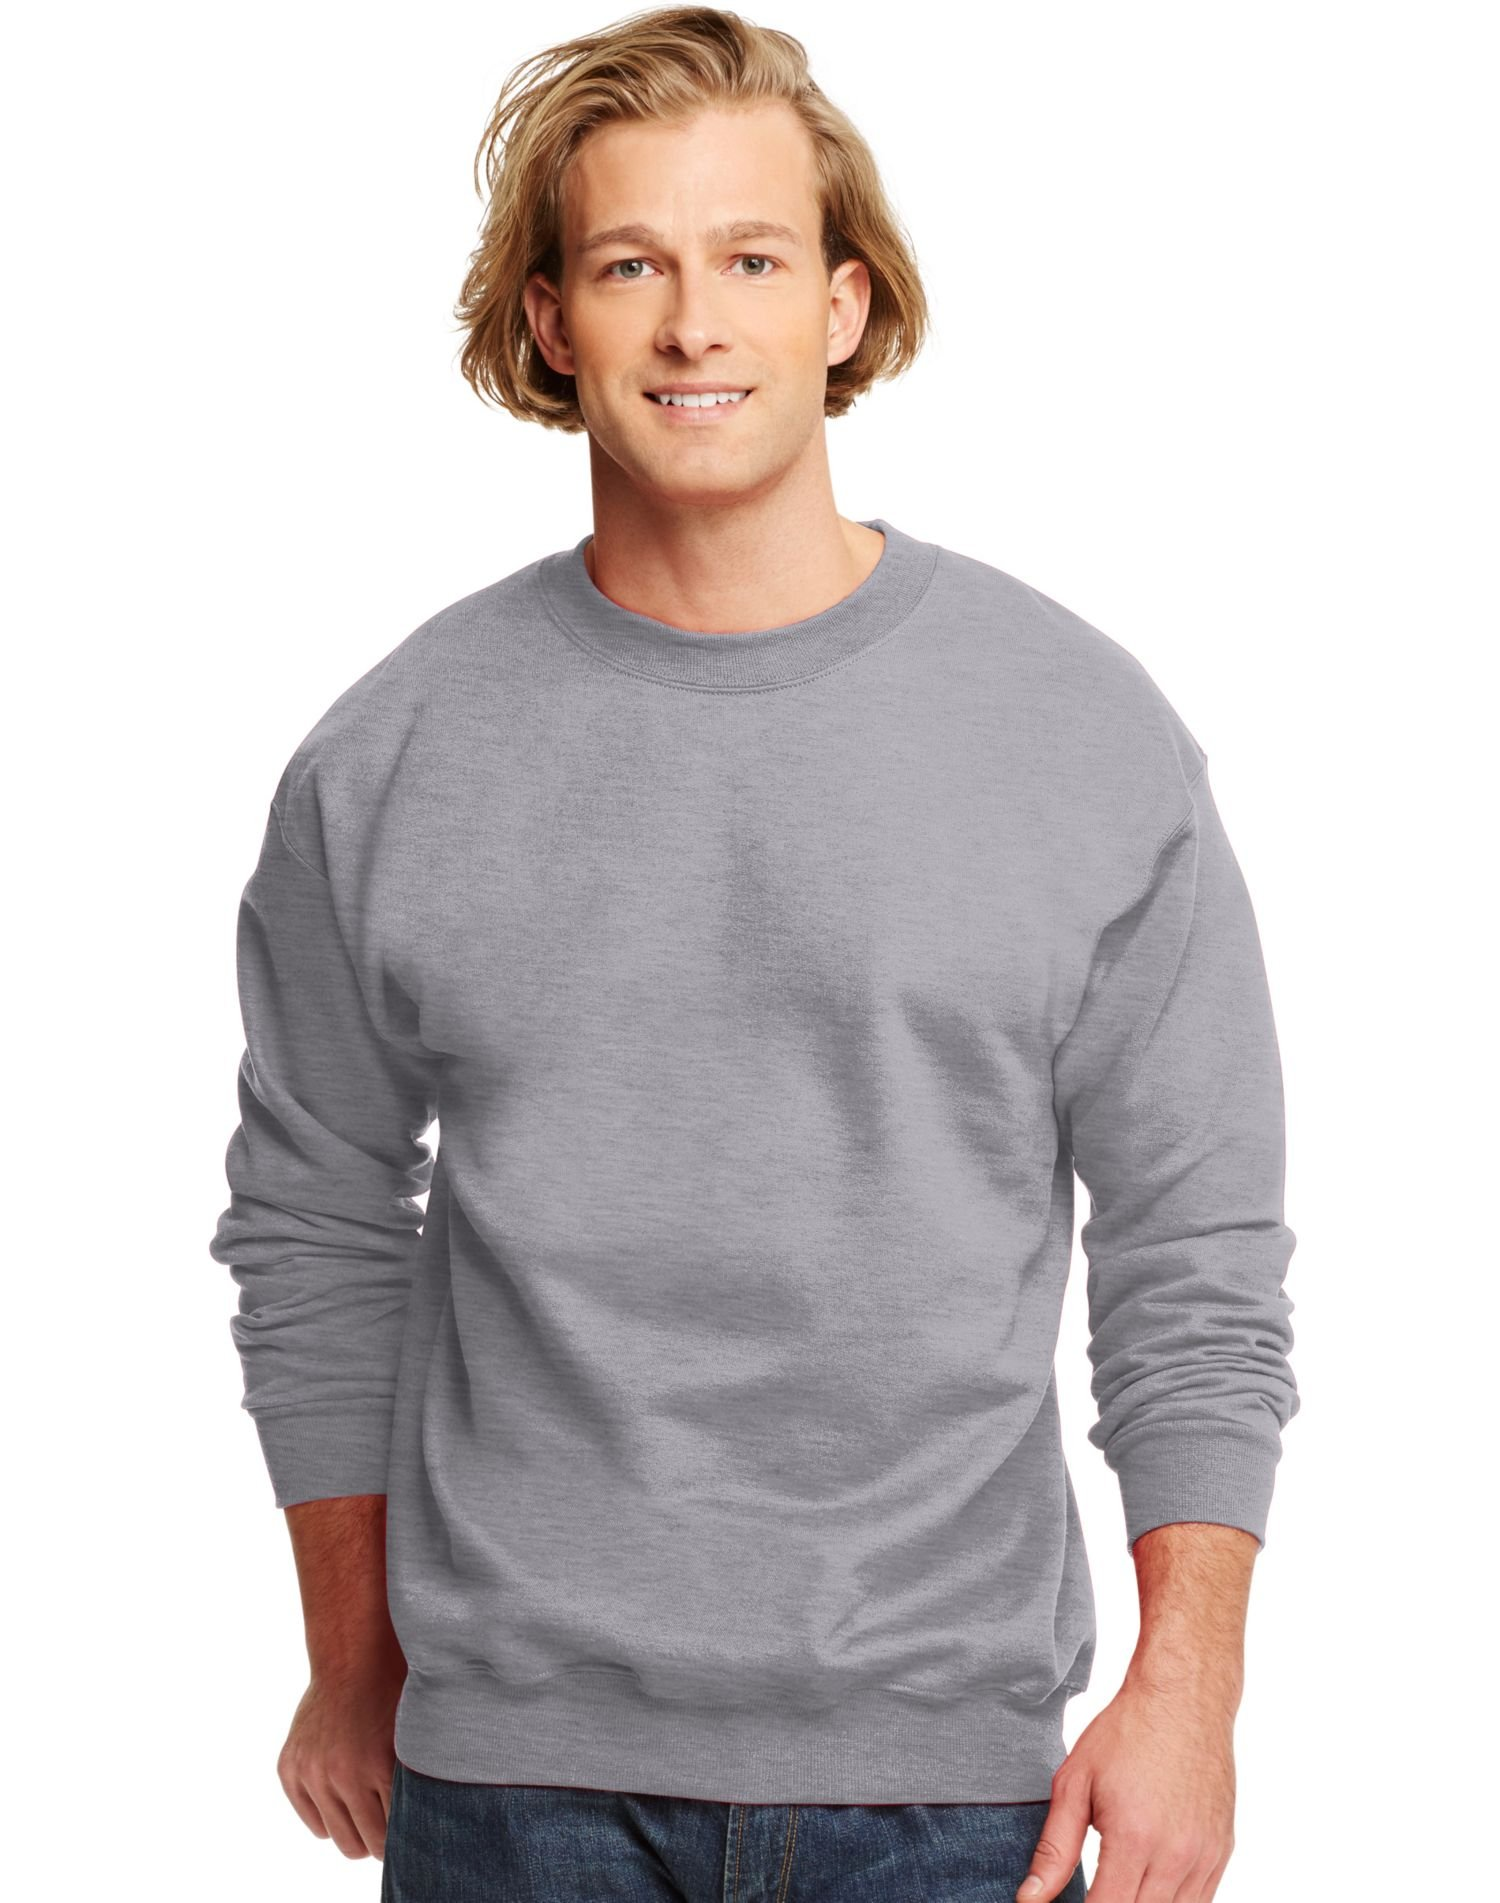 Hanes Men's Ultimate Cotton Fleece Crew Sweater, Oxford Gray, L US by Hanes